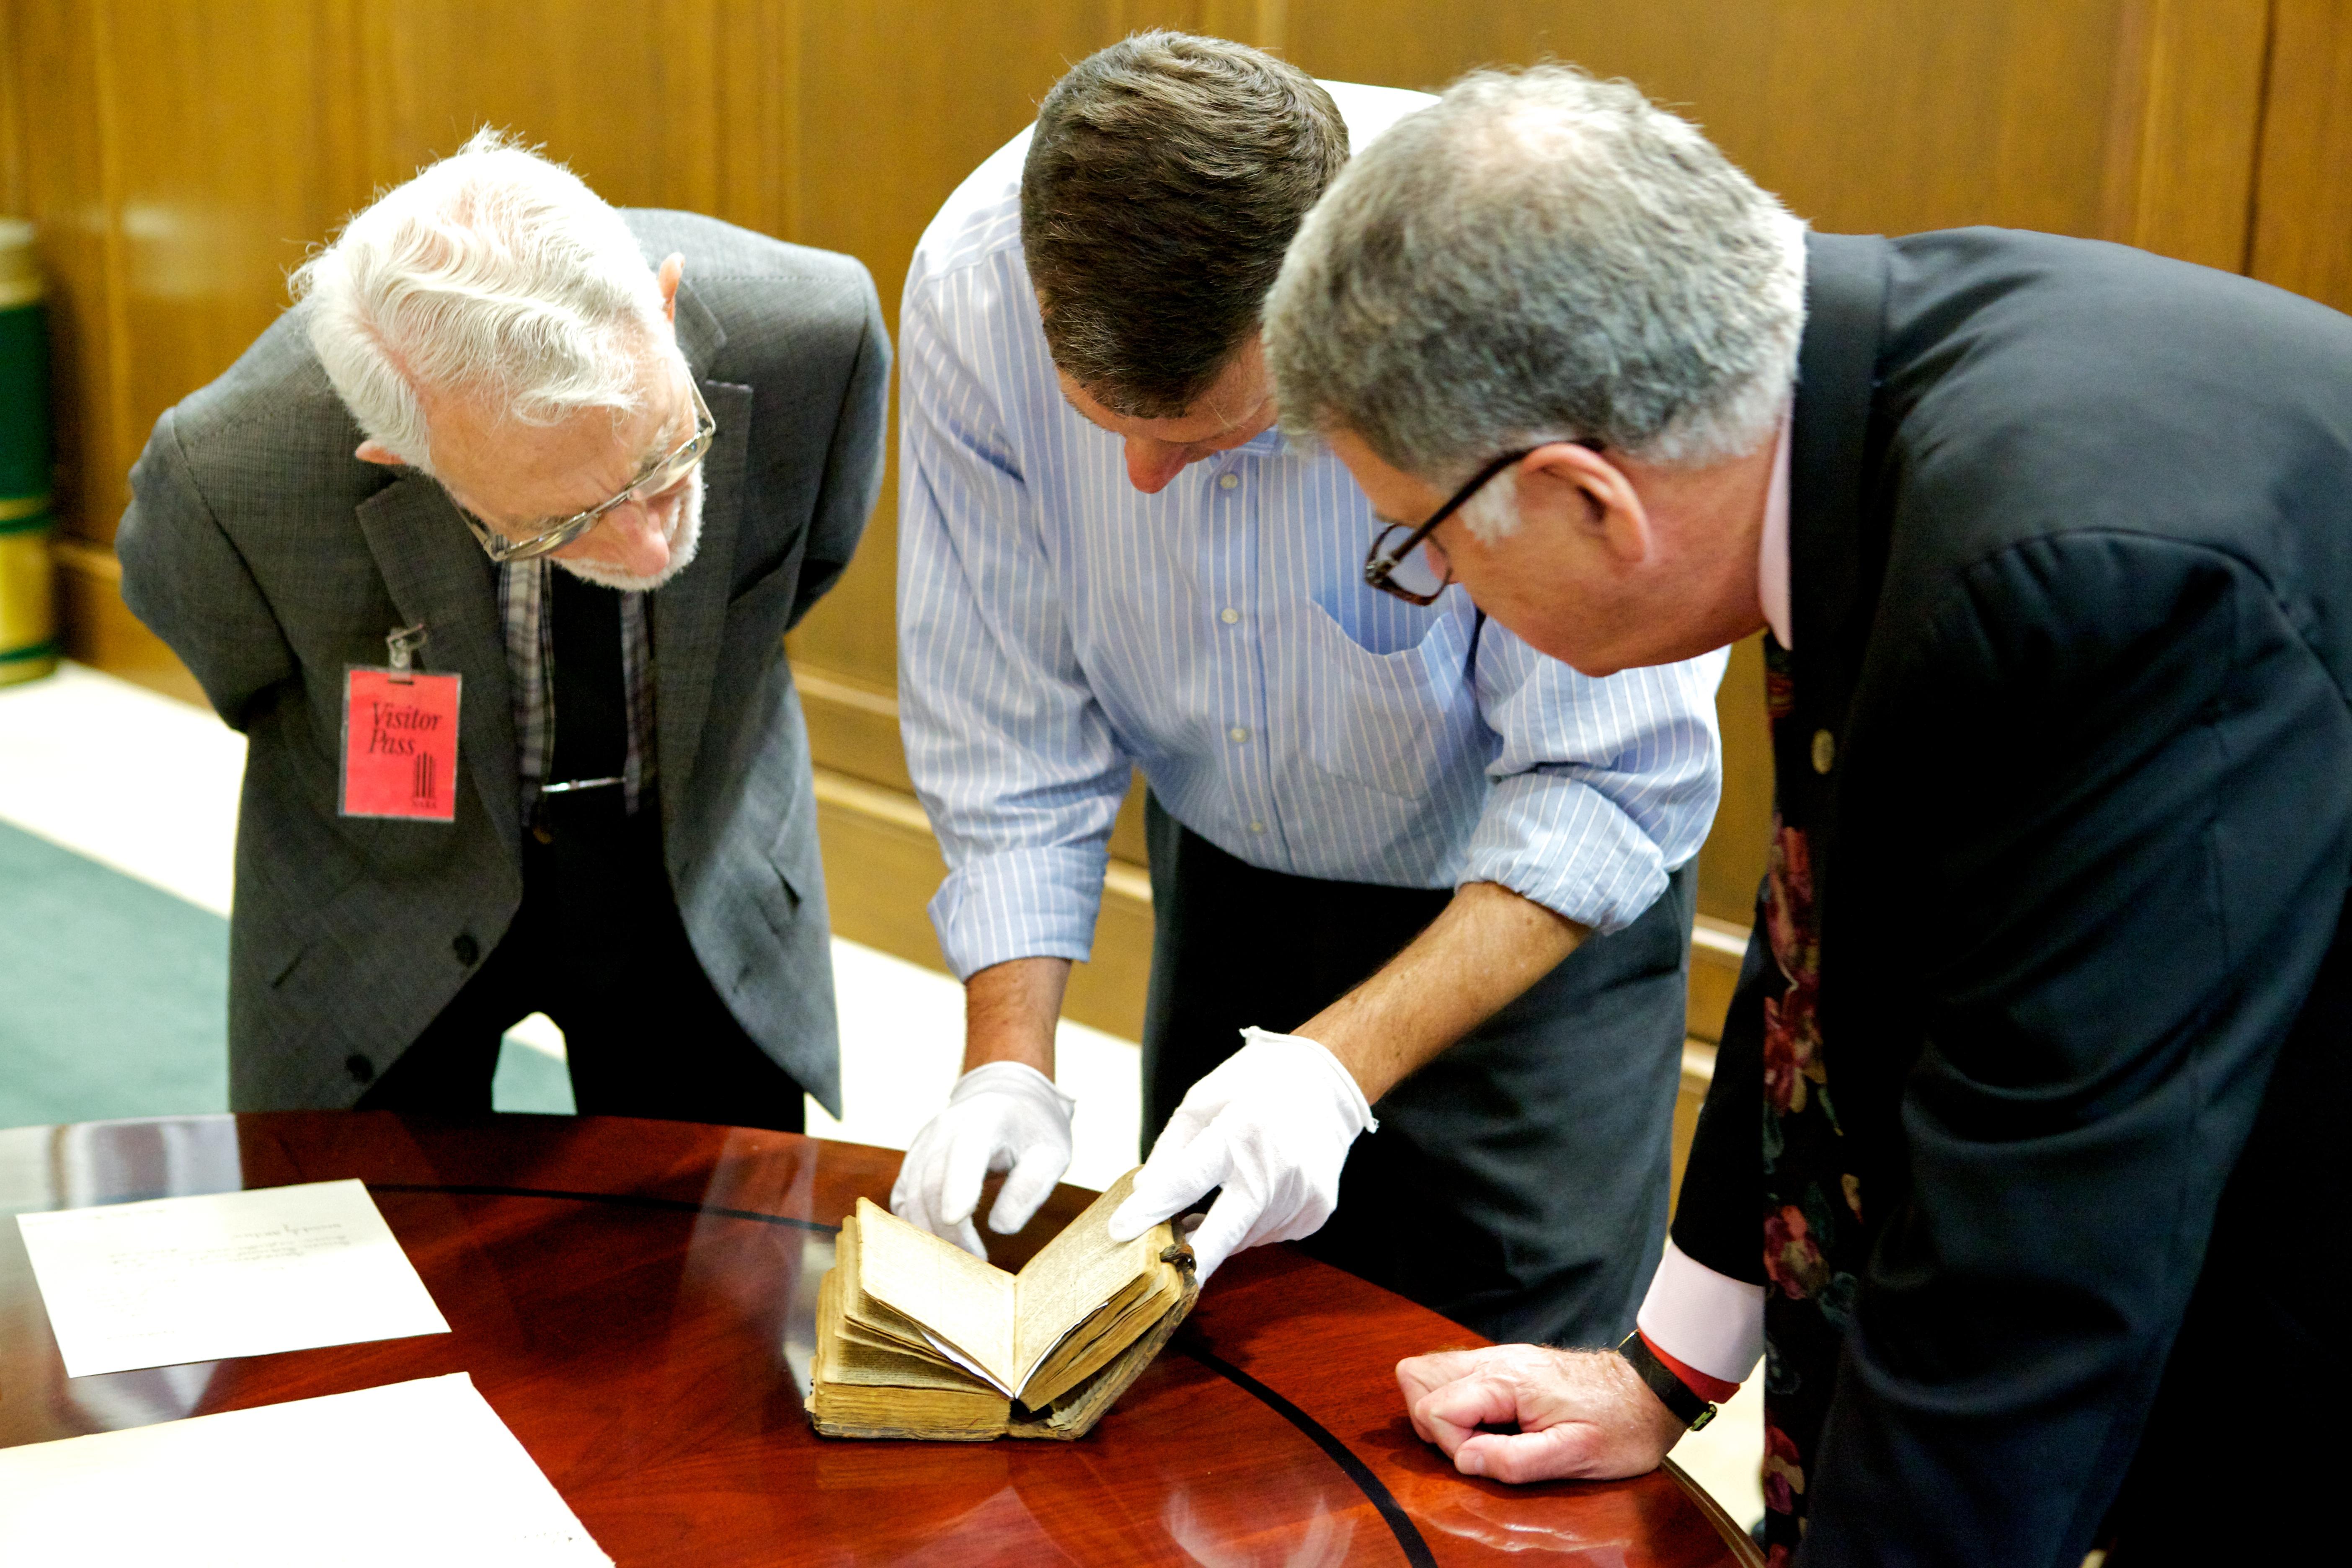 Staff Swearing In with Rev War BibleStaff Swearing In with Rev War Bible